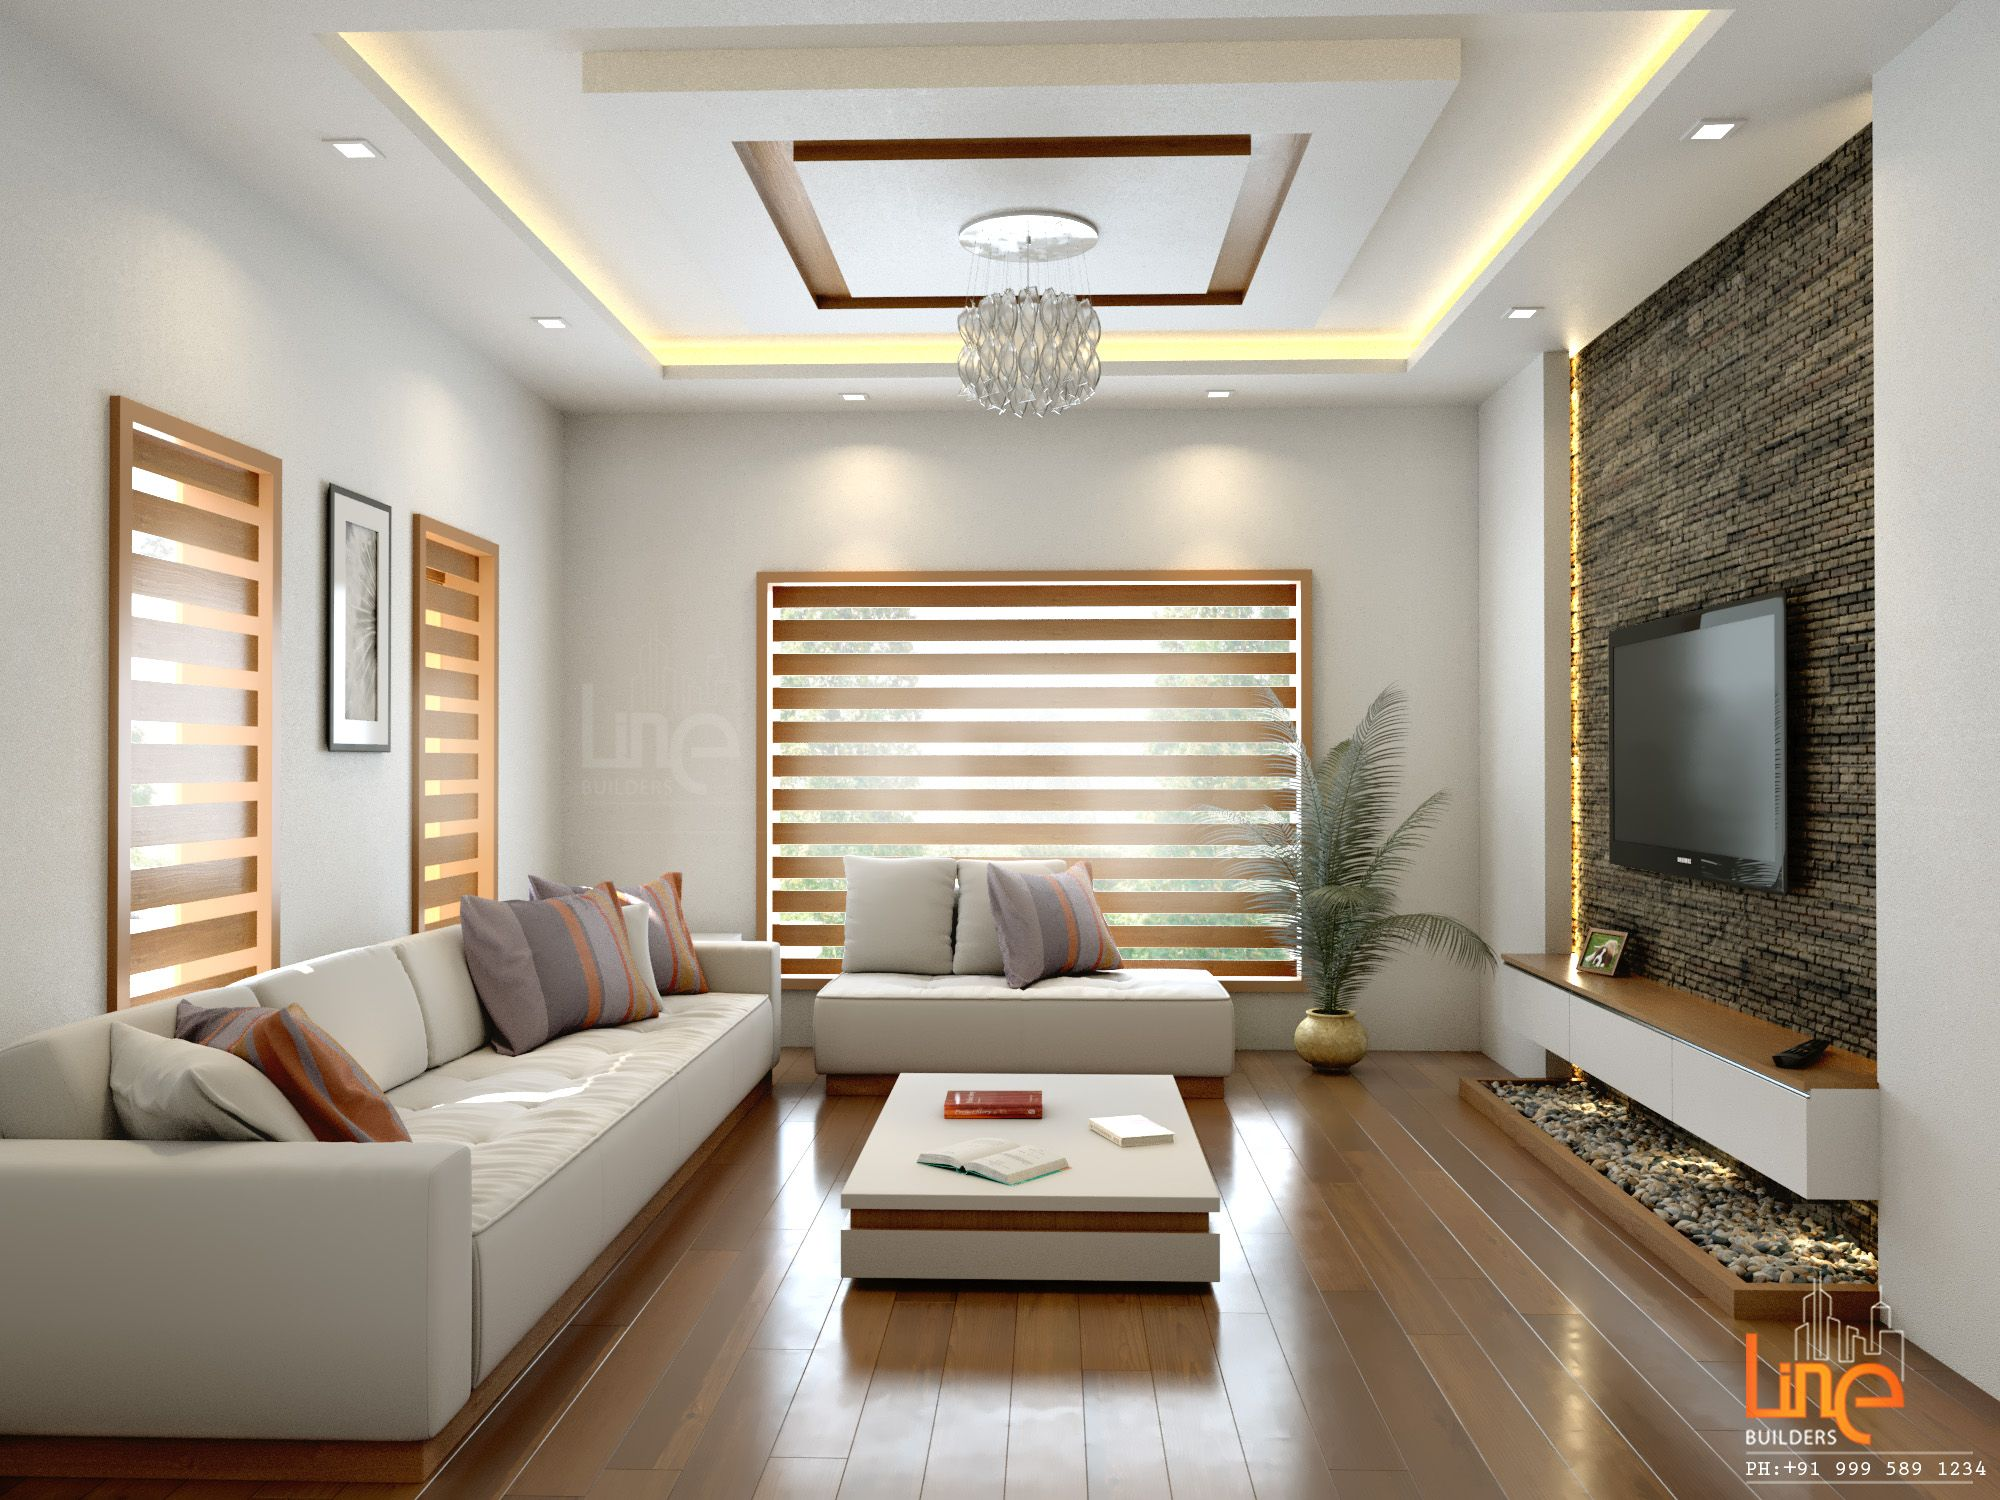 Line S Interior Design Contact Wattsup 91 9995891234 91 9745478000 Mai Ceiling Design Living Room Living Room Design Decor Modern Bedroom Interior